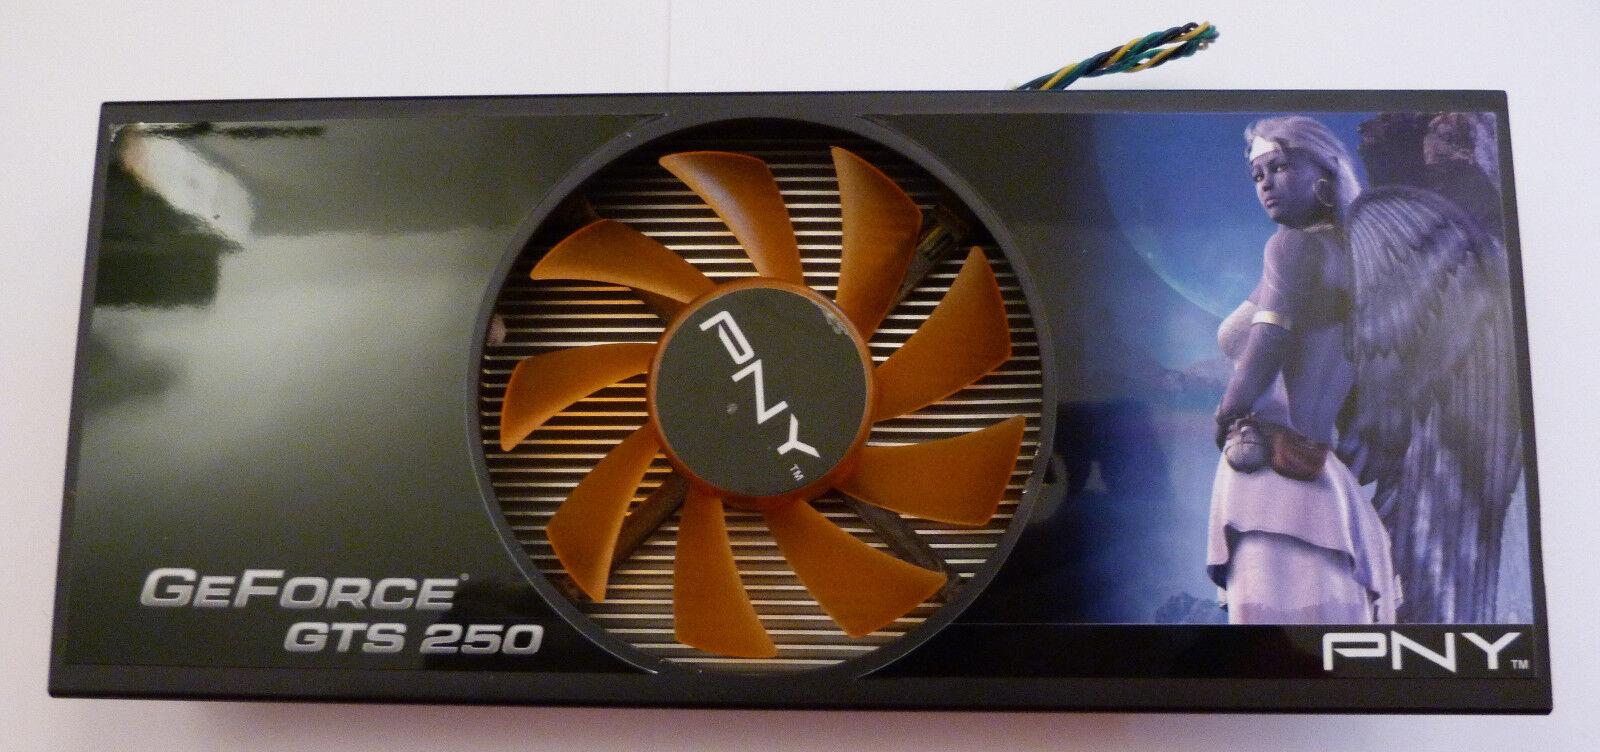 NVIDIA GeForce GTS 250 Grafikkarten Kühler, Lüfter + Zubehör, Wärmeleitpaste